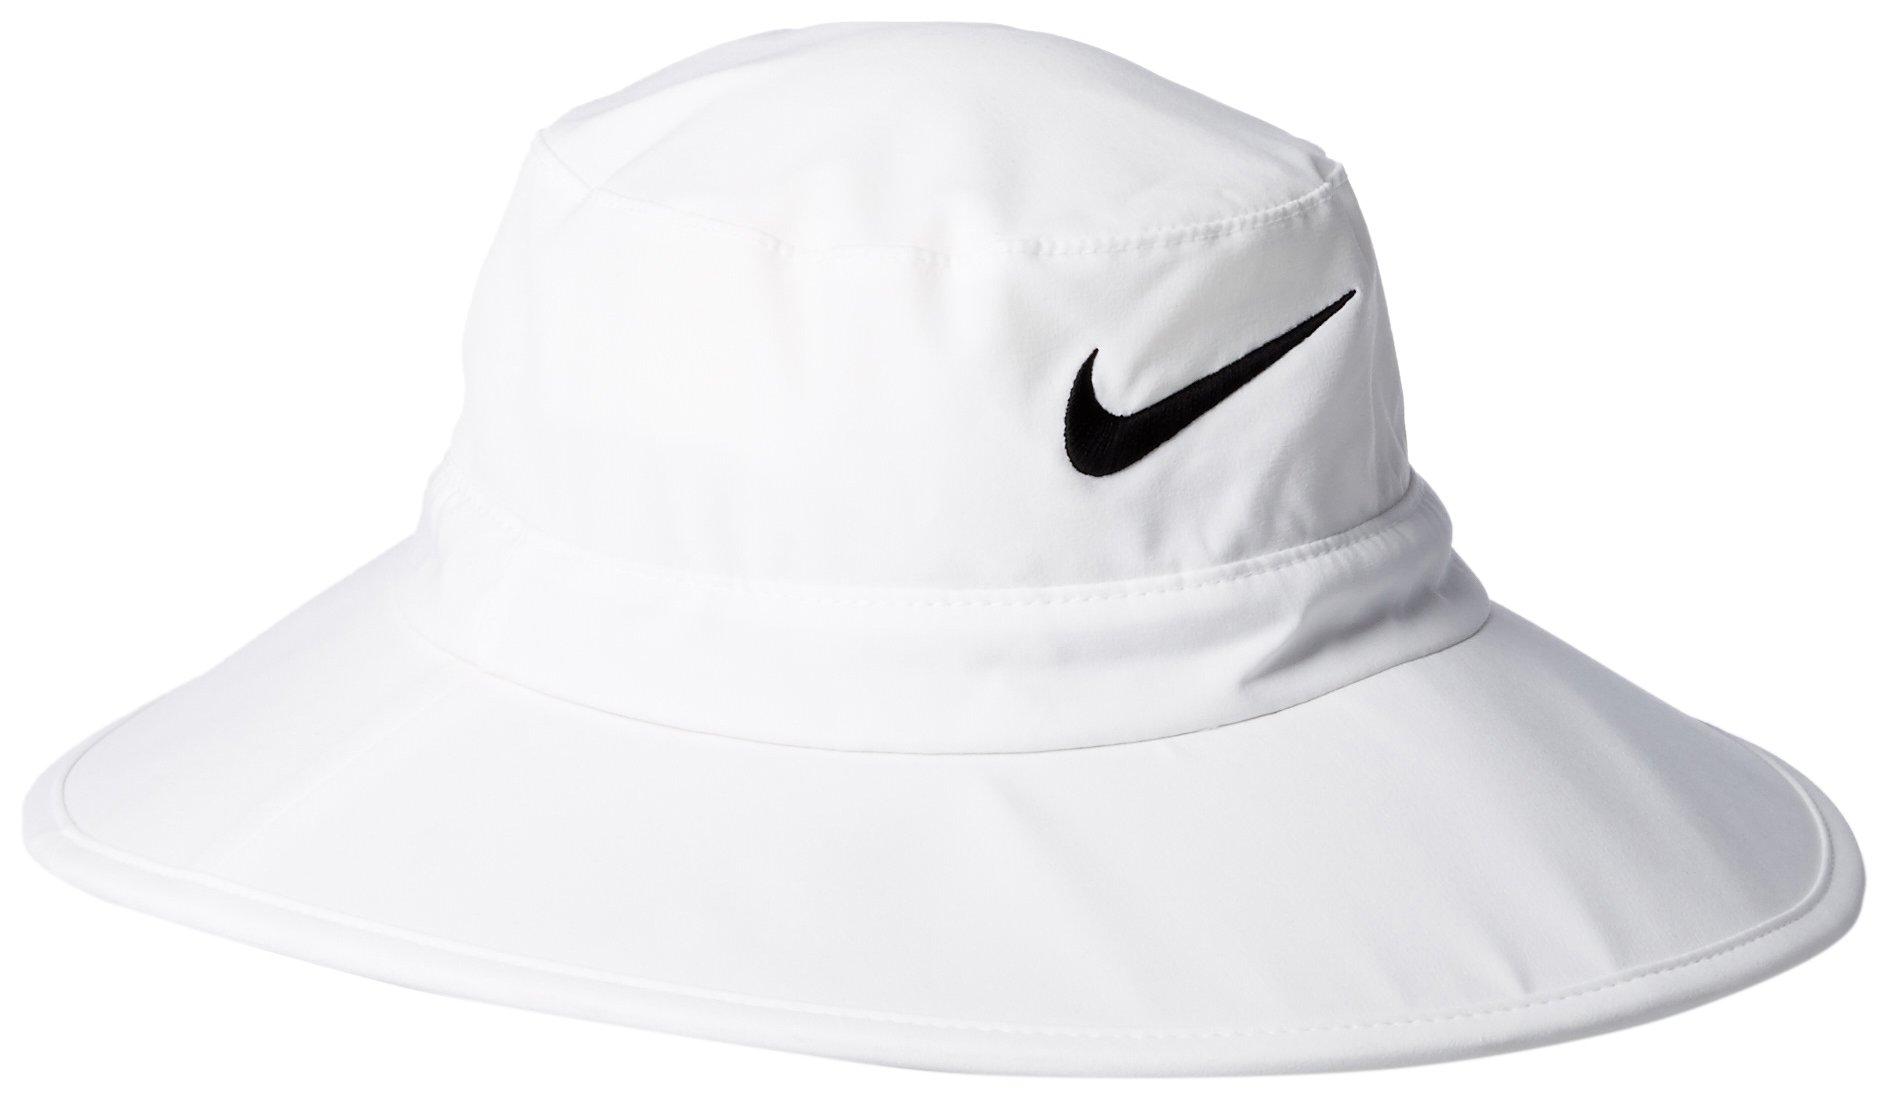 9b379593382 Galleon - Nike Golf Sun Protect Bucket Hat White Black (Medium Large)